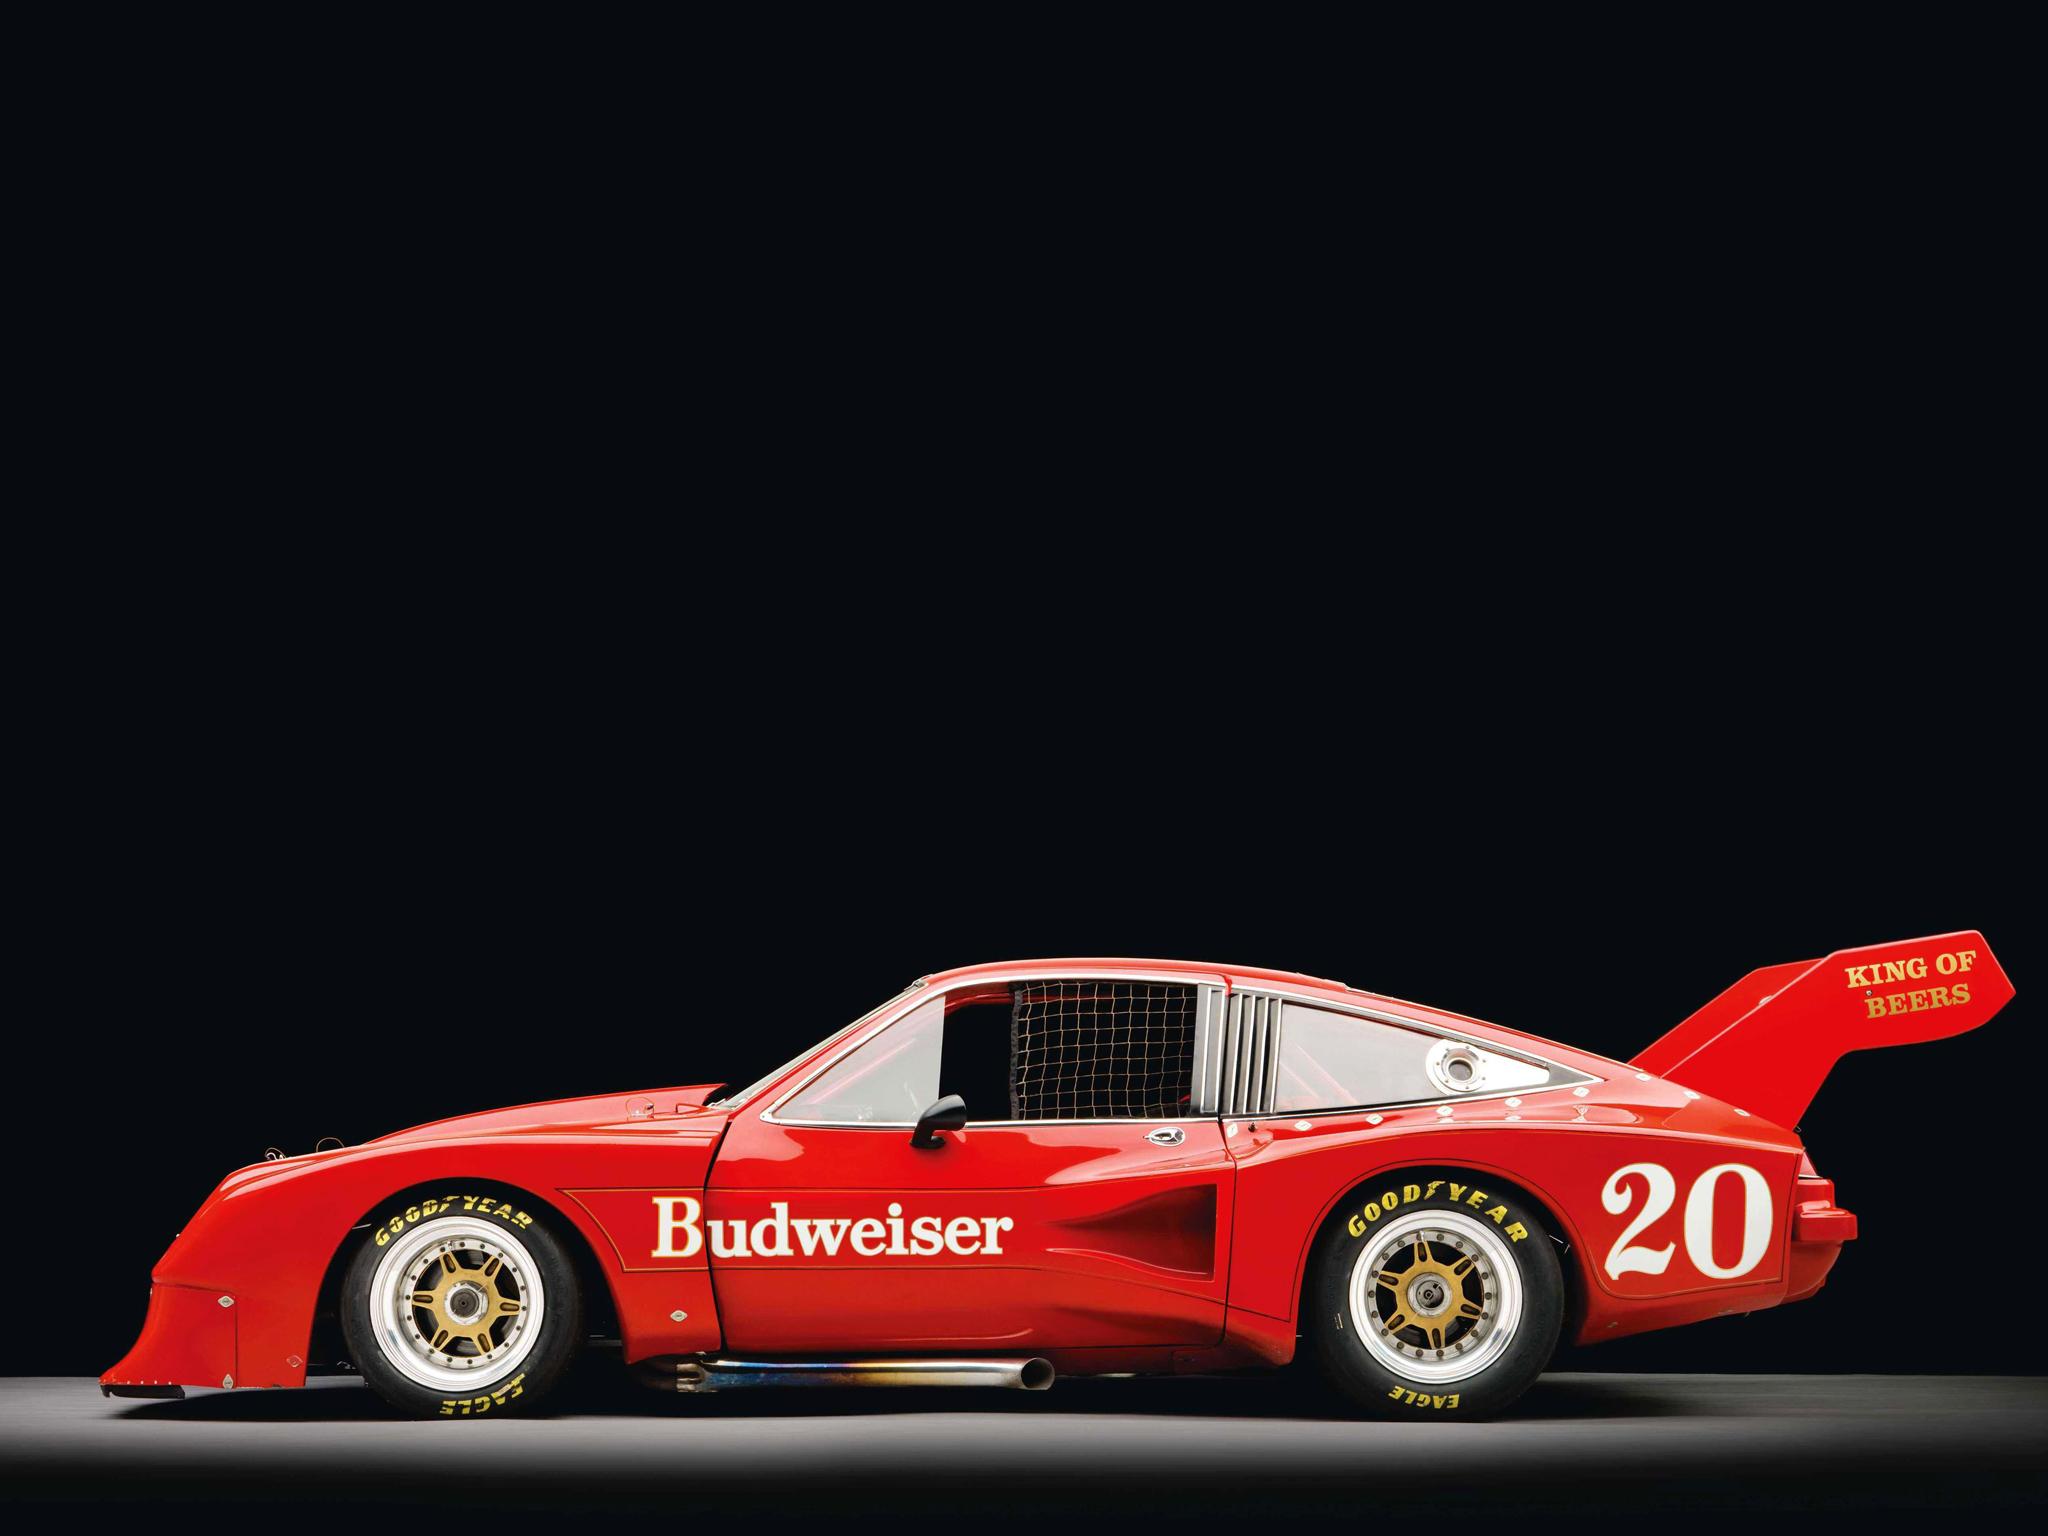 The Cars 2 Wallpaper 1975 Chevrolet Monza Dekon Imsa Gto Race Racing Classic F